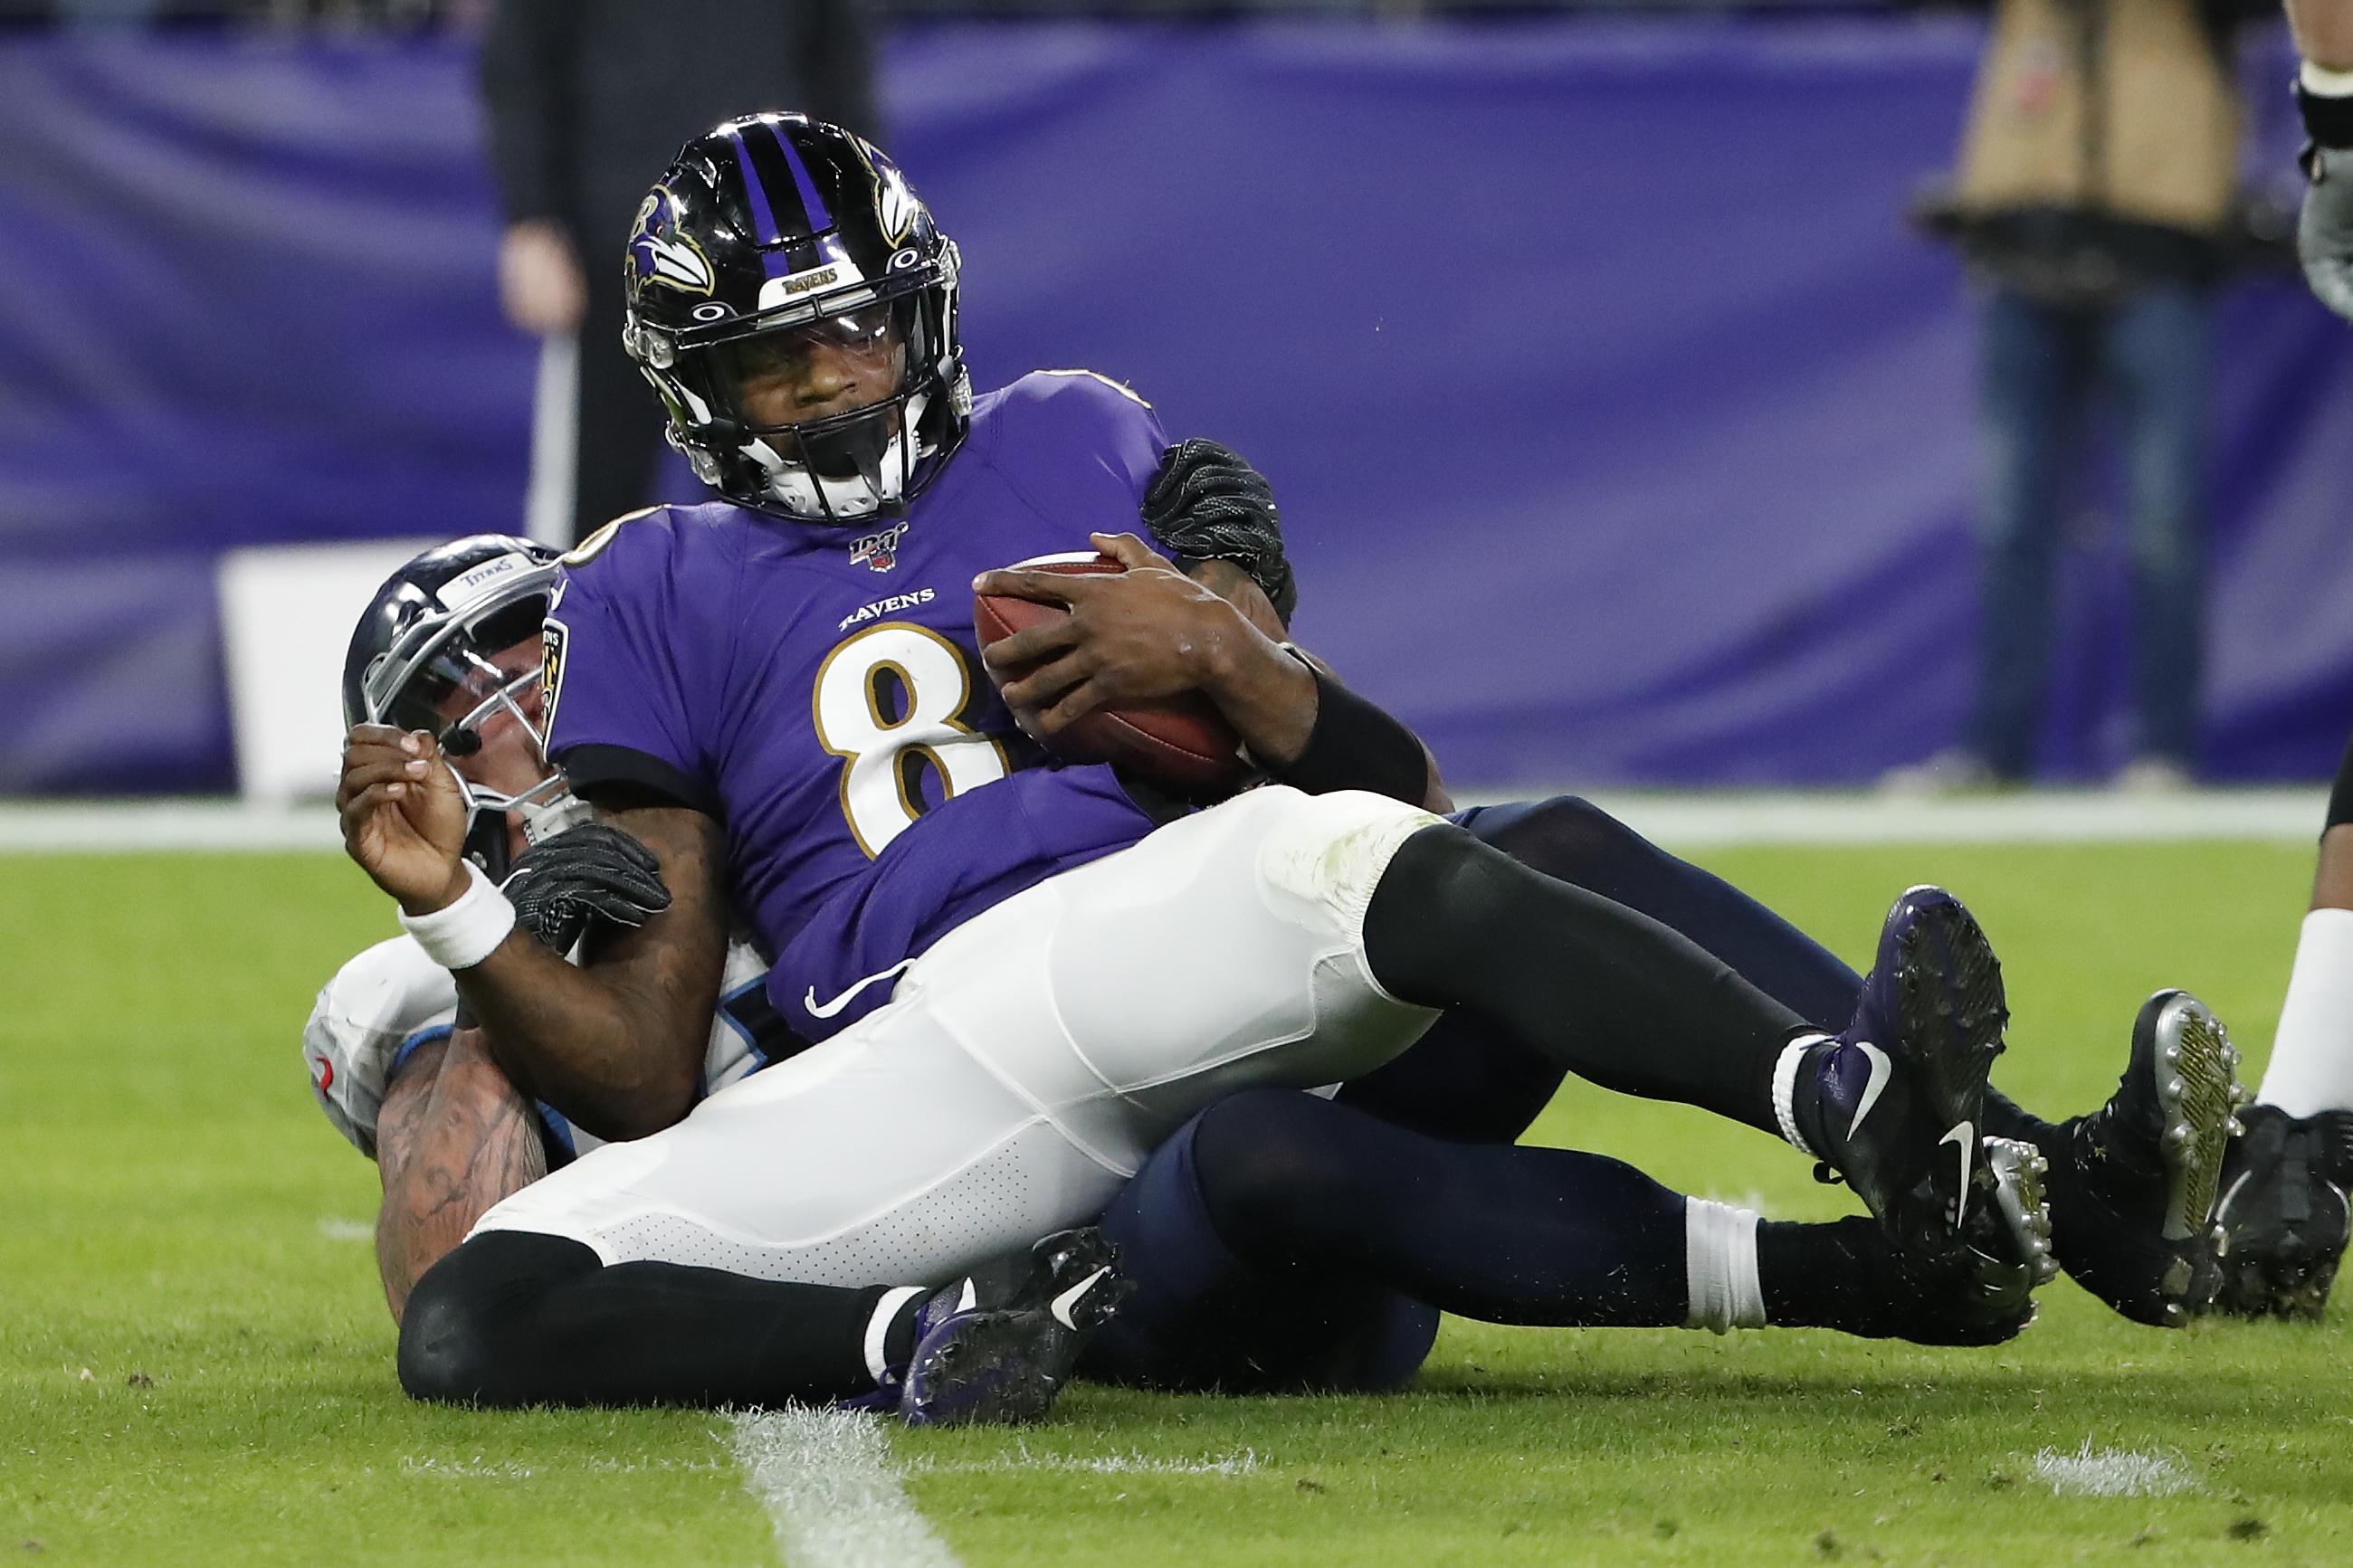 It's happening... Ravens open 2020 vs. Browns